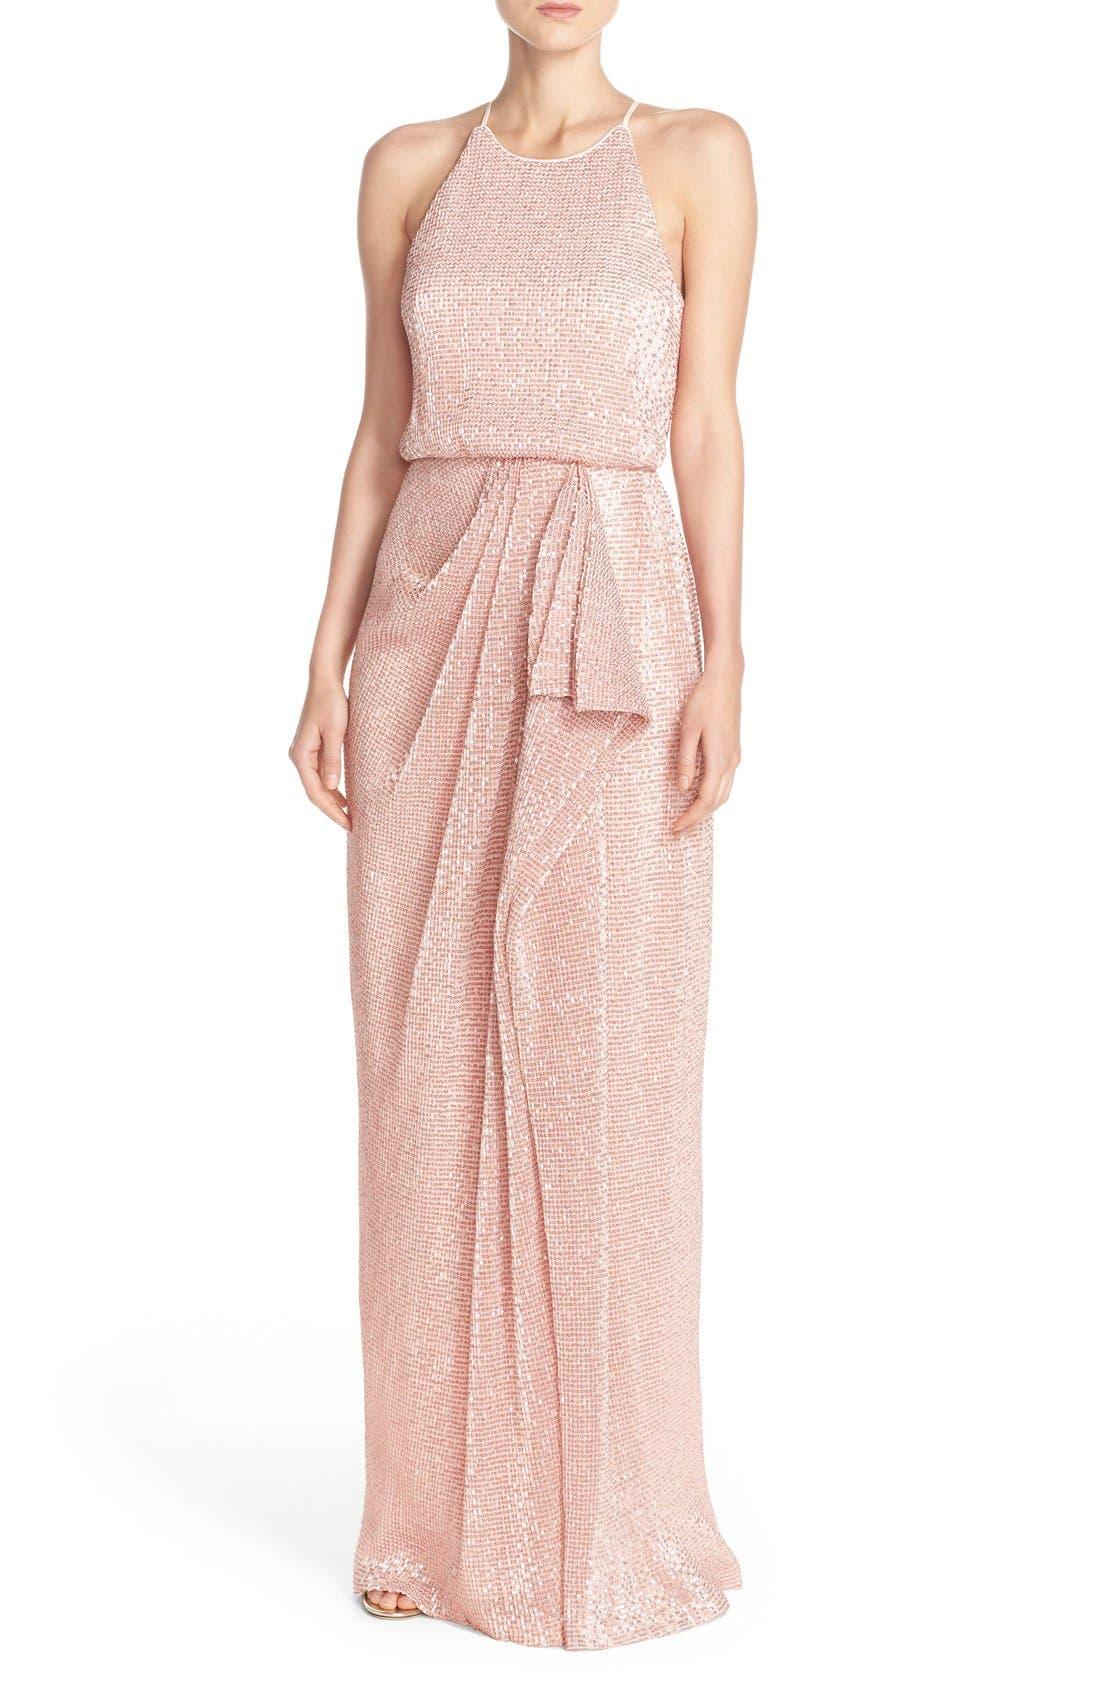 Alternate Image 1 Selected - Badgley Mischka Sequin Mesh Blouson Gown